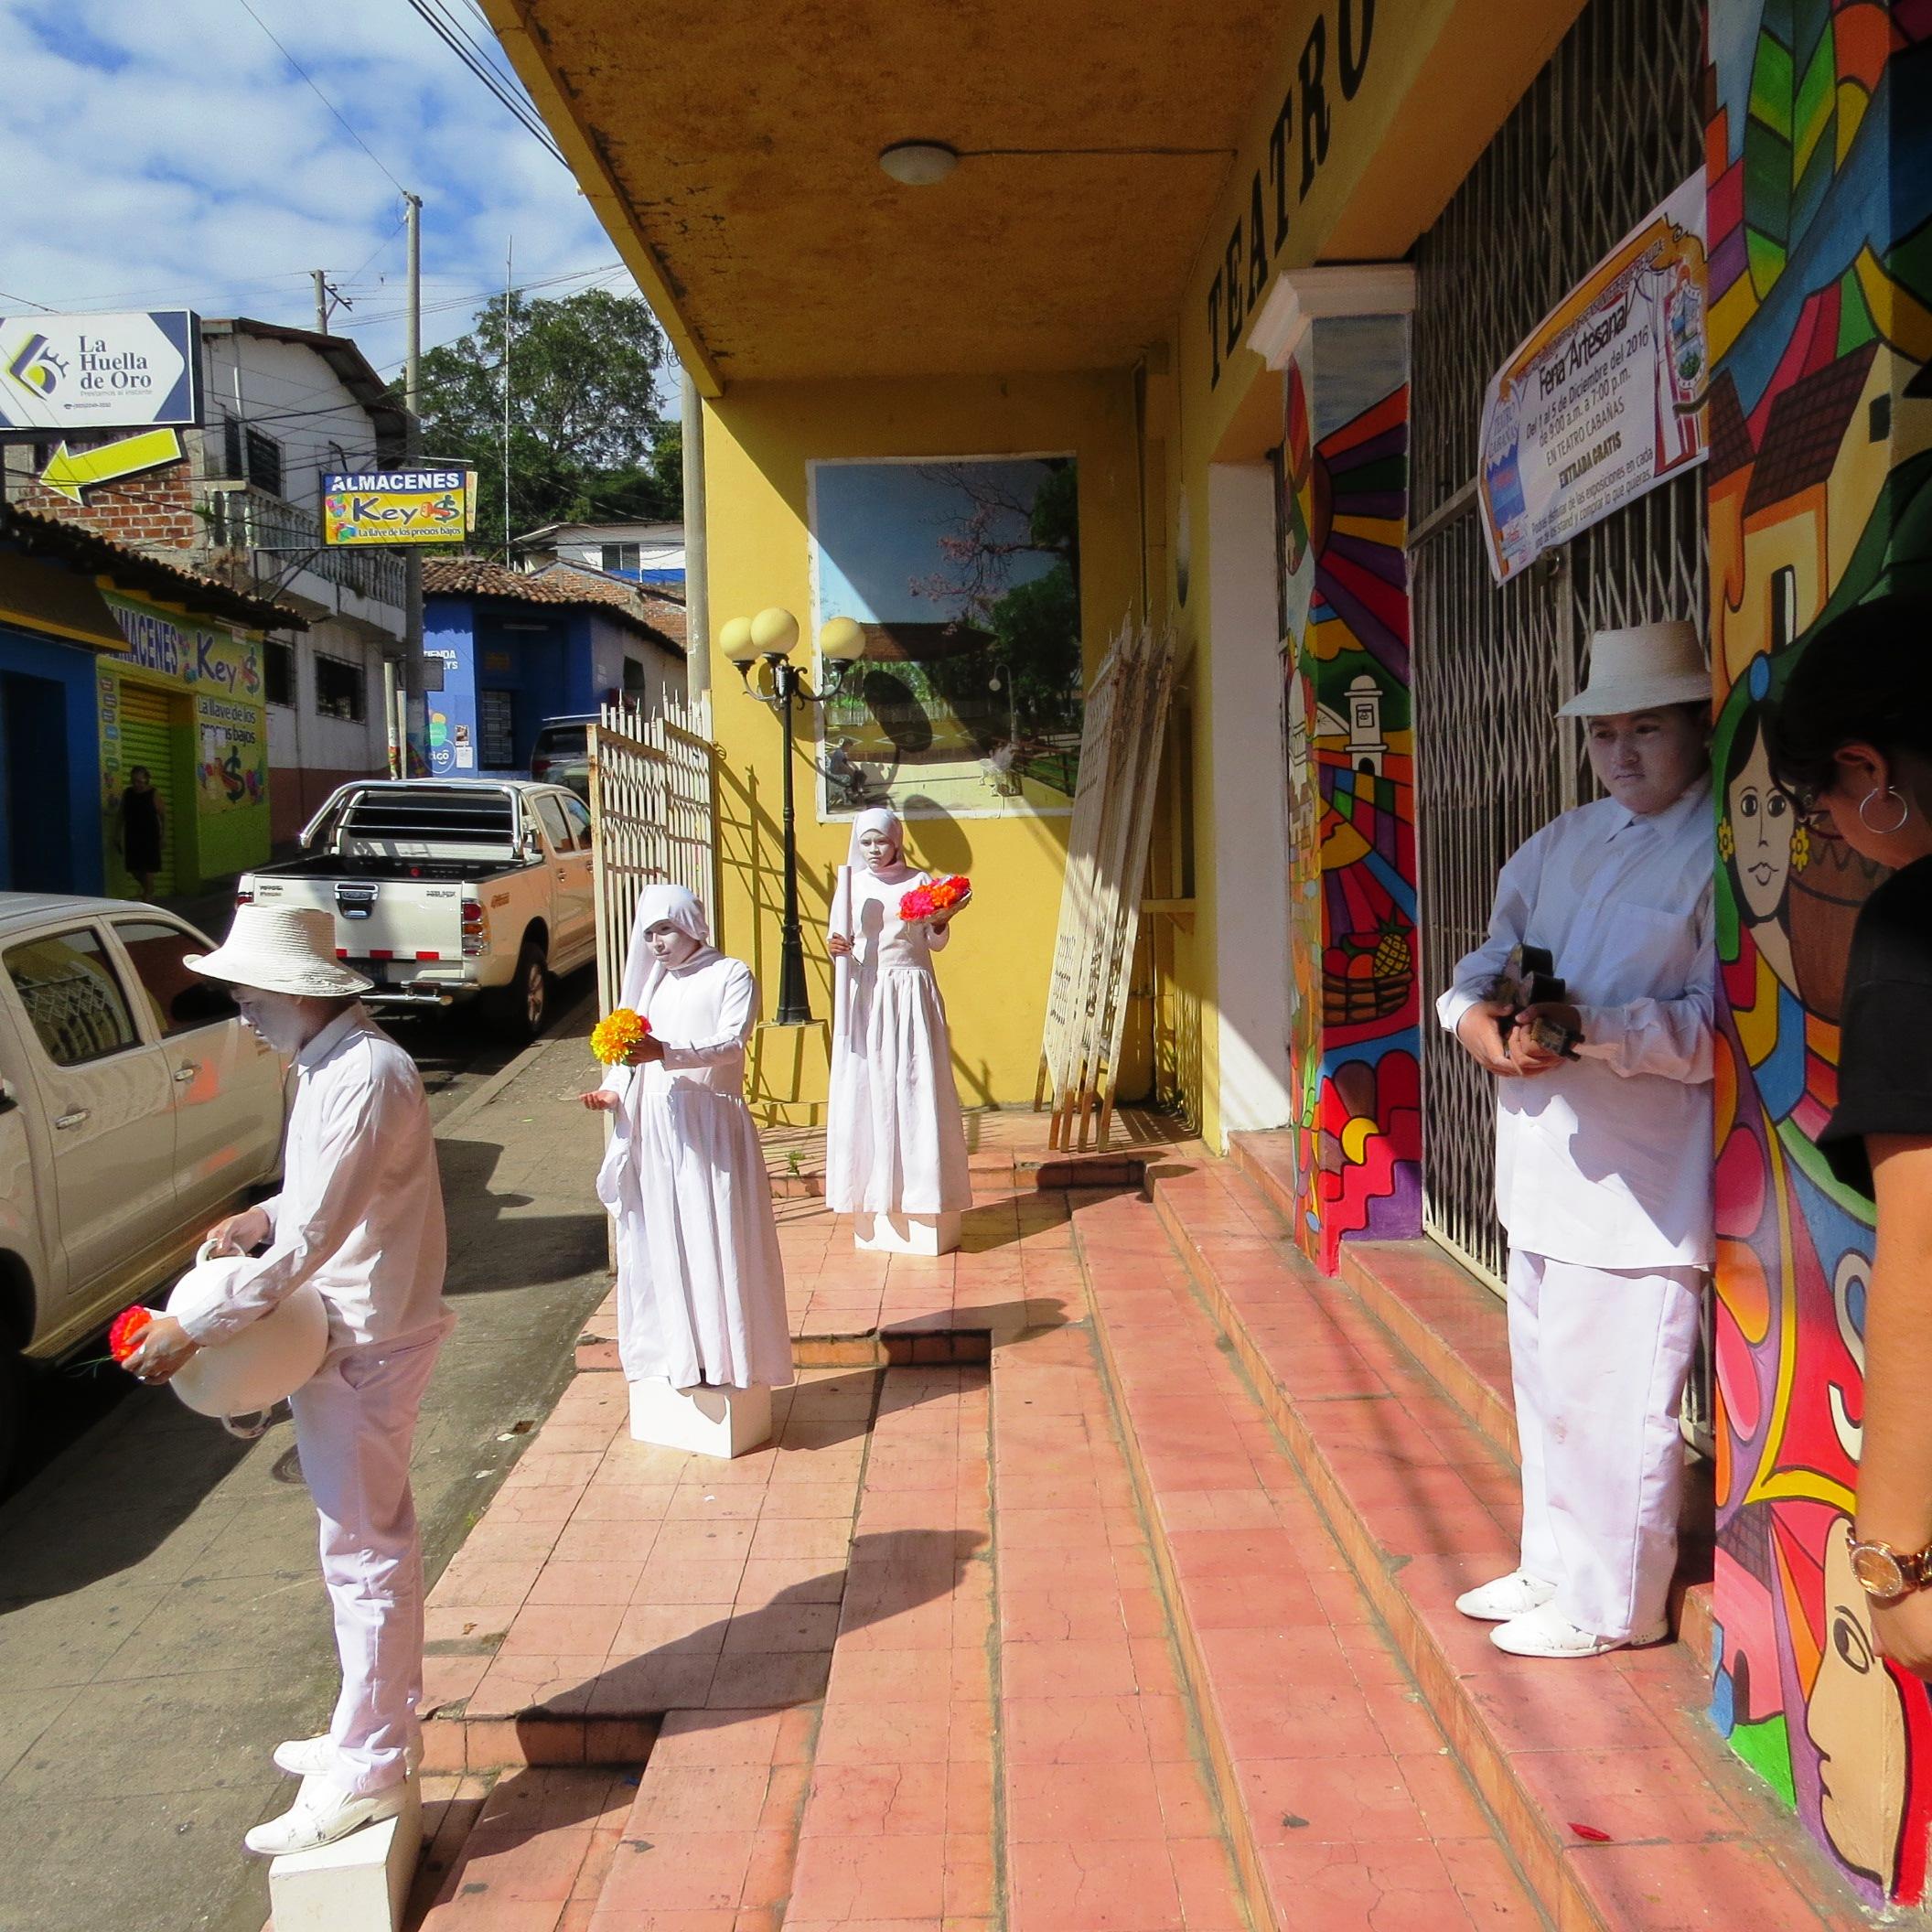 calle-maura-echeverria-img_1292